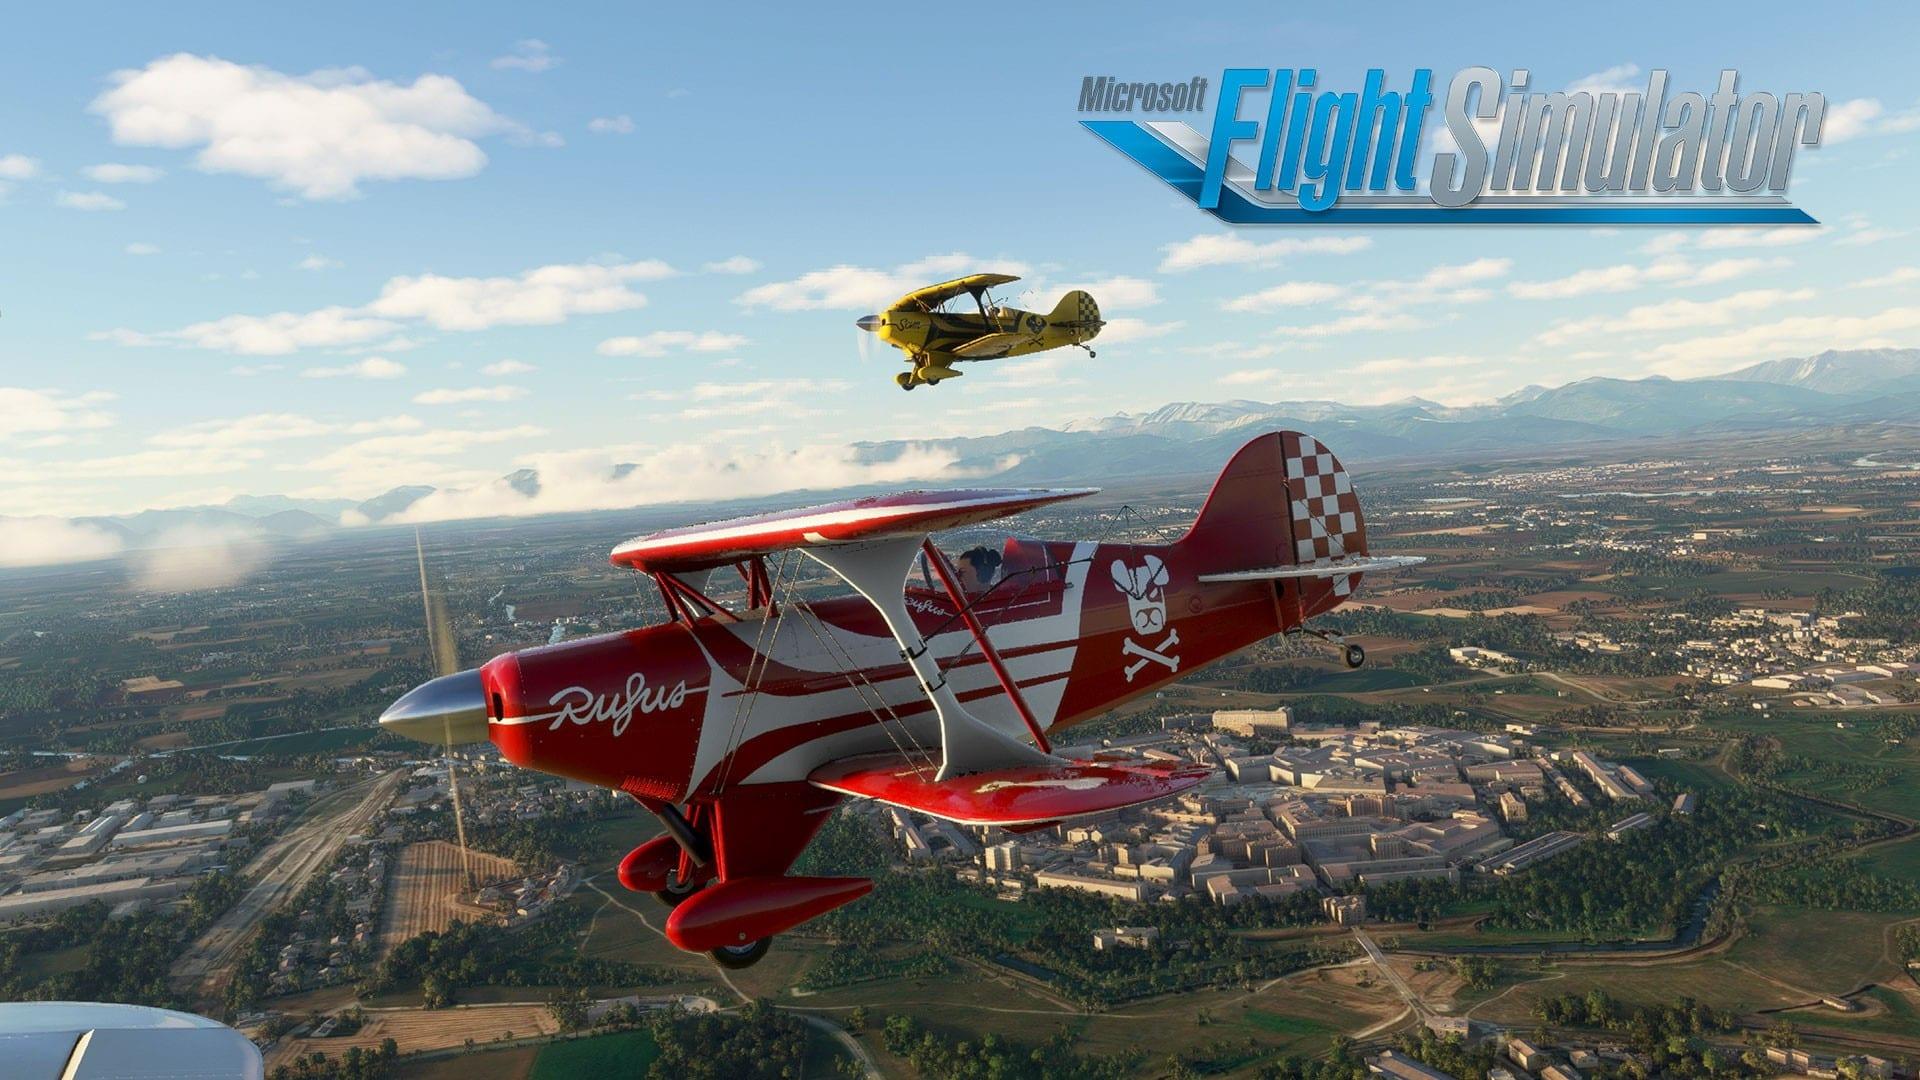 Microsoft Flight Simulator Xbox Series X/S: Release Date and Gameplay